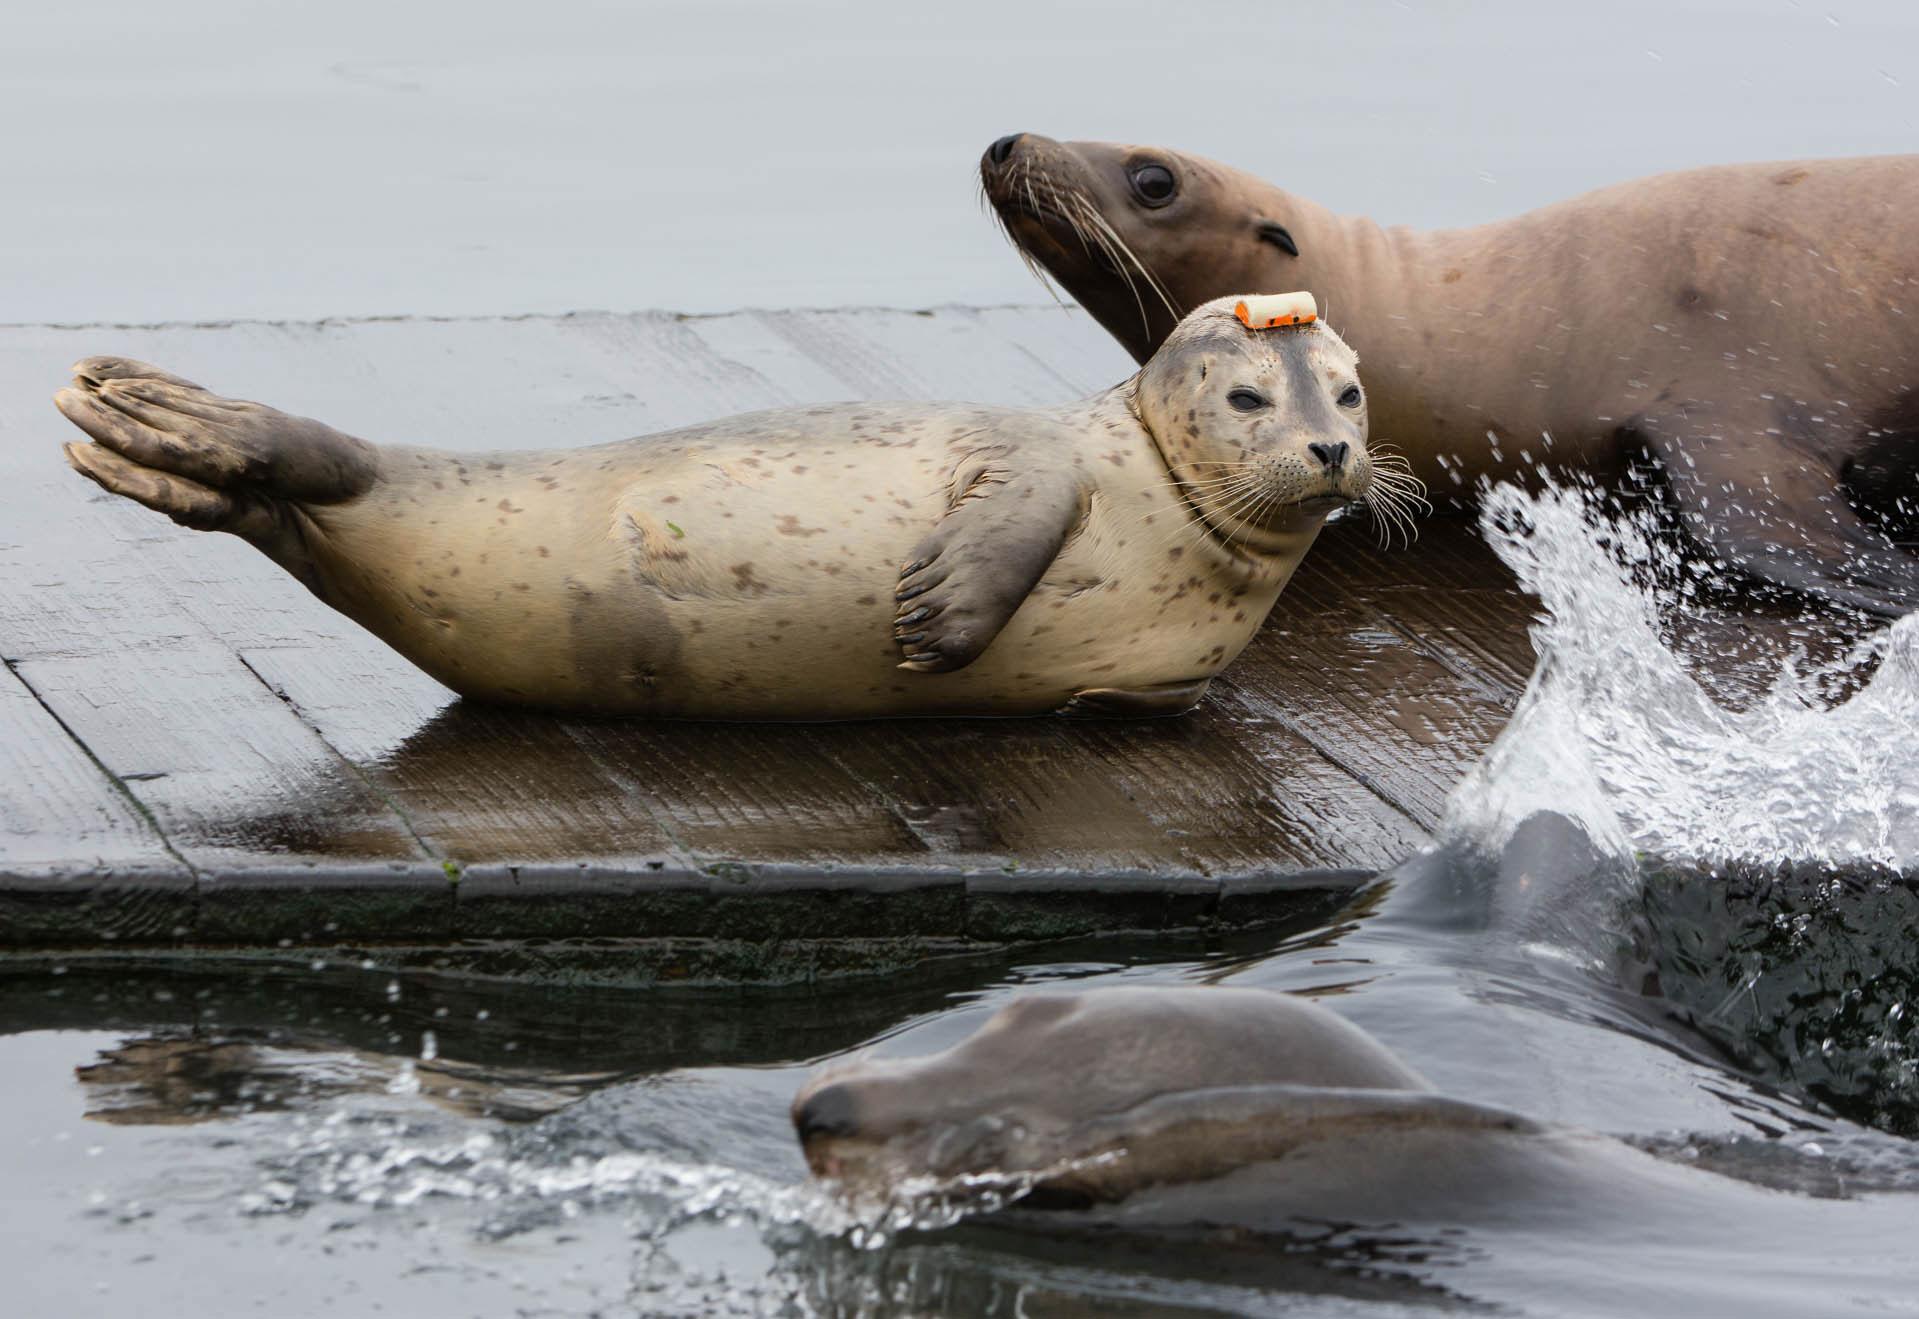 Harbor Seal Pup  (Phoca vitulina) Splashed by California Sea Lion  (Zalophus californianus) - Moss Landing, California  Nikon D7200 + Nikon 200-400mm f4.0 VR